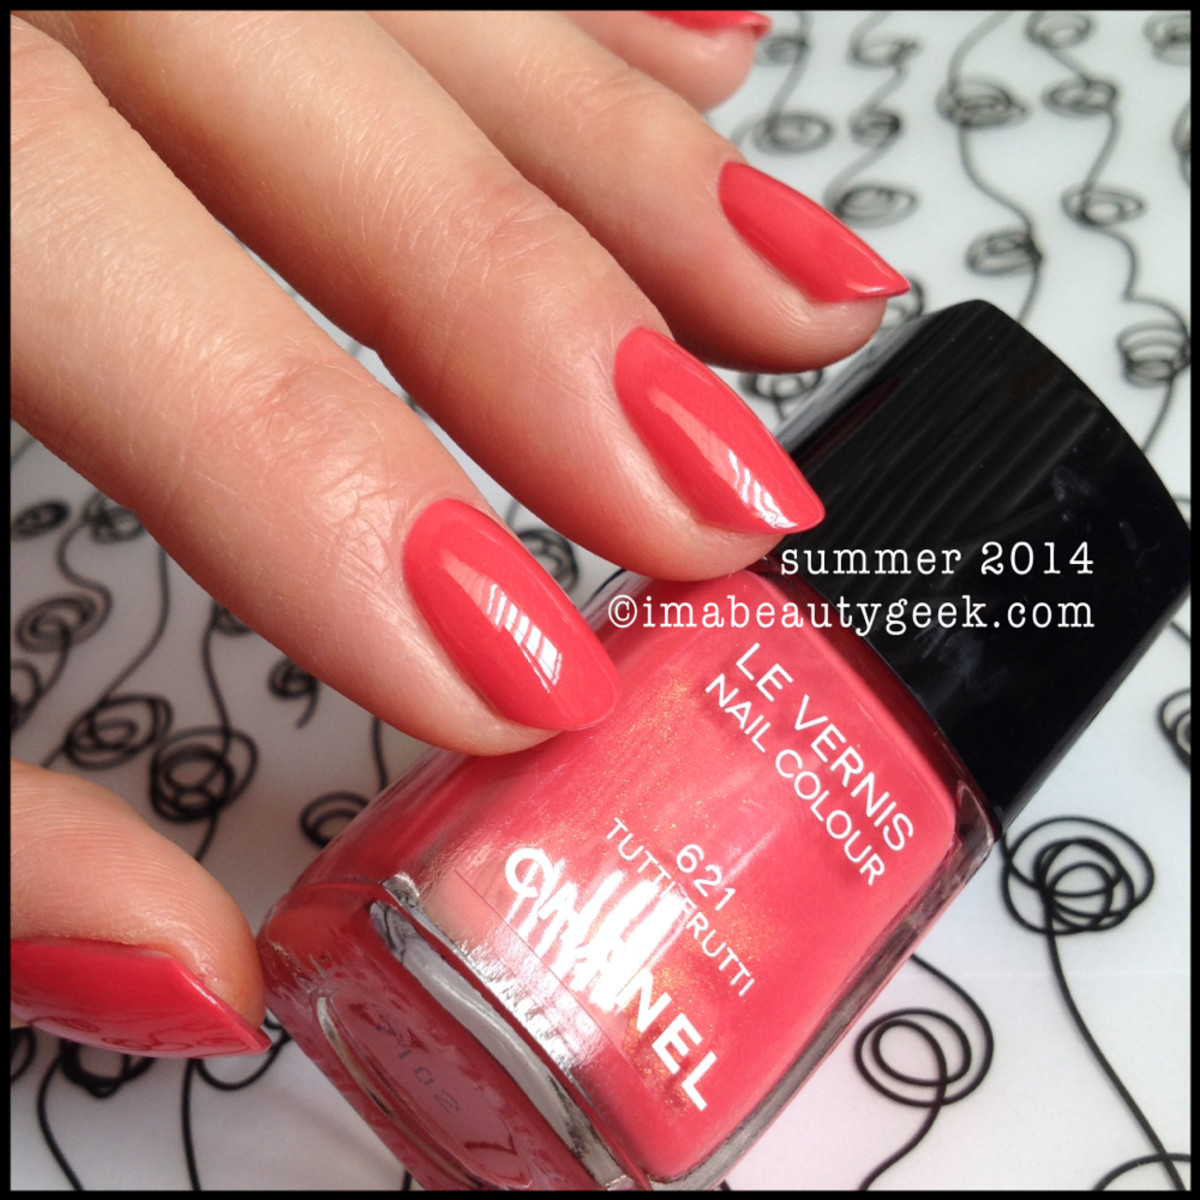 Chanel Tutti Frutti 621 Summer 2014